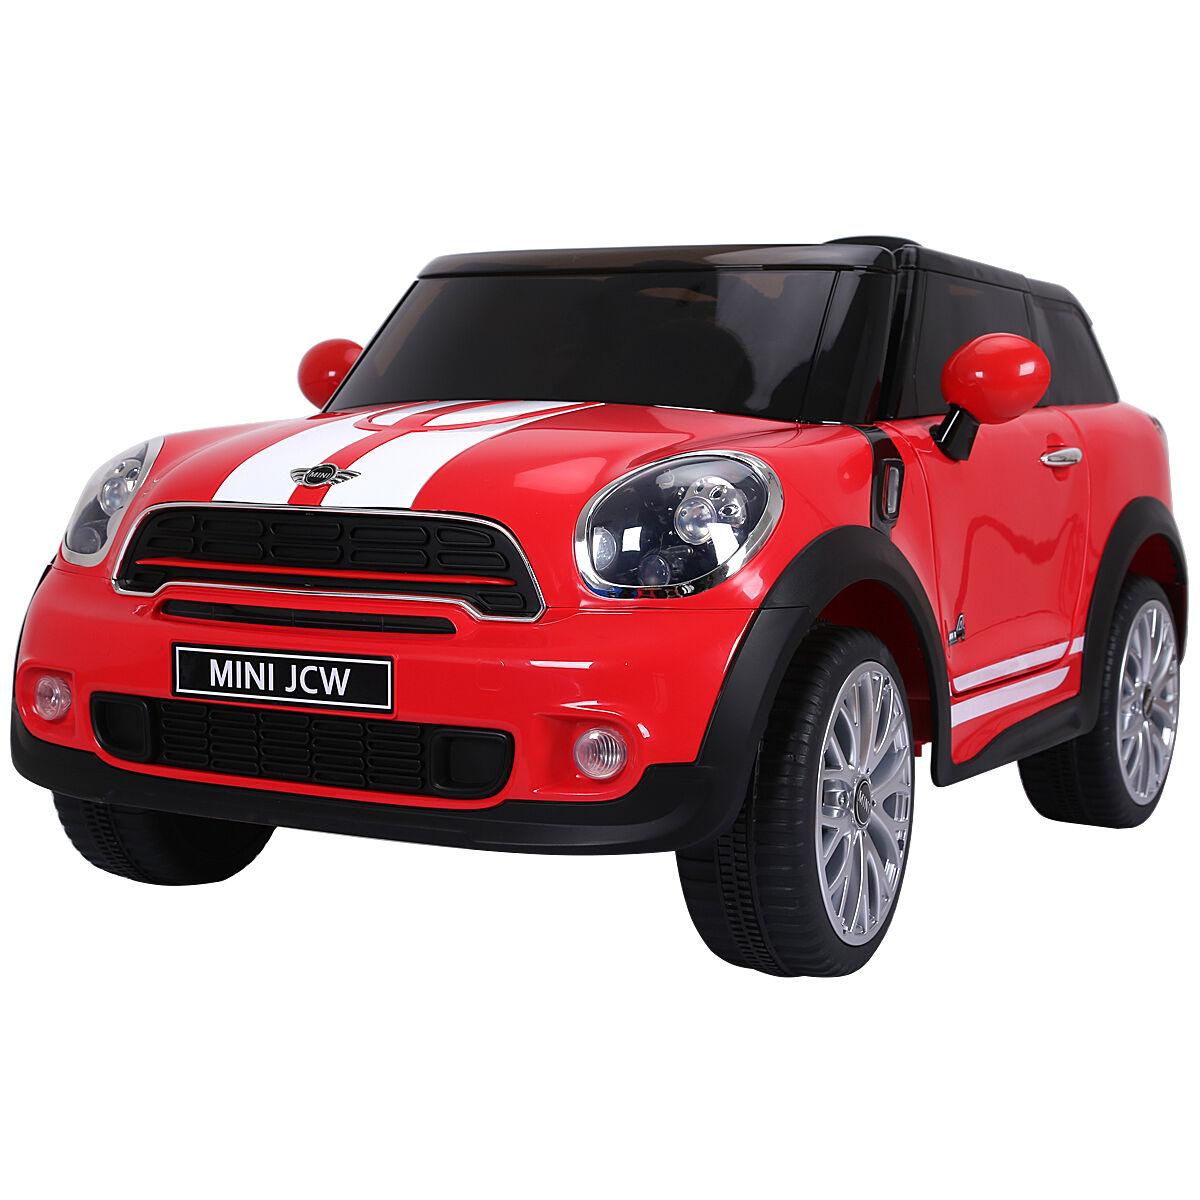 12v elektro - mini - paceman kinder auto lizenzierte r   c fernbedienung mp3 - rot